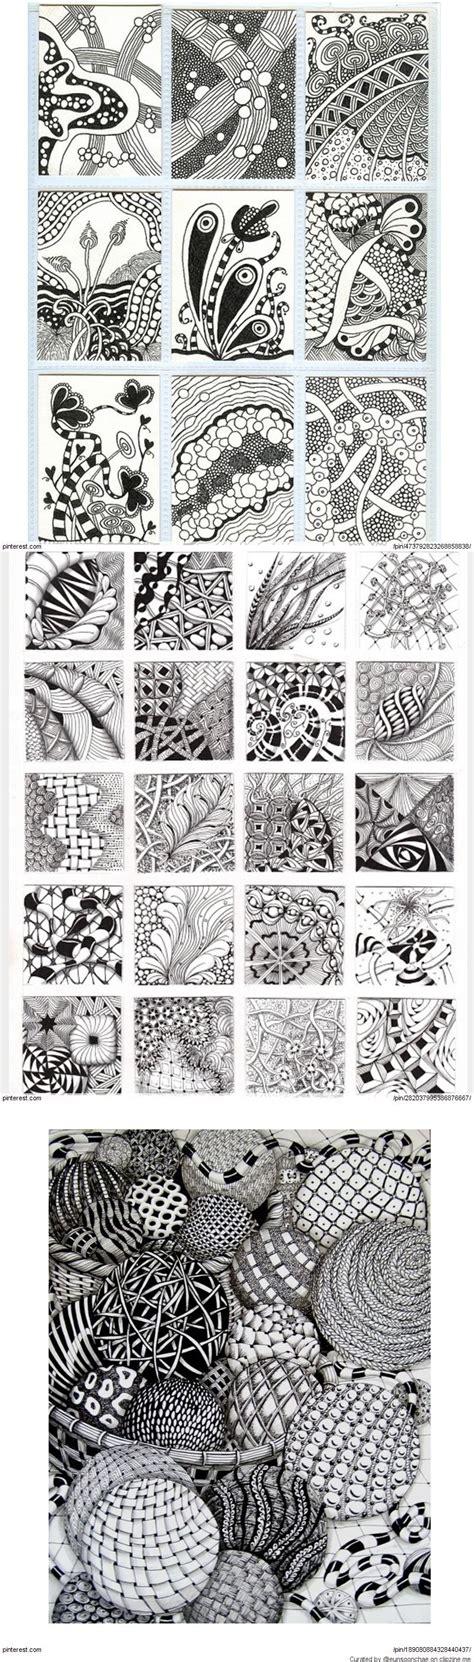 zentangle pattern cubine zentangle patterns ideas products i love pinterest